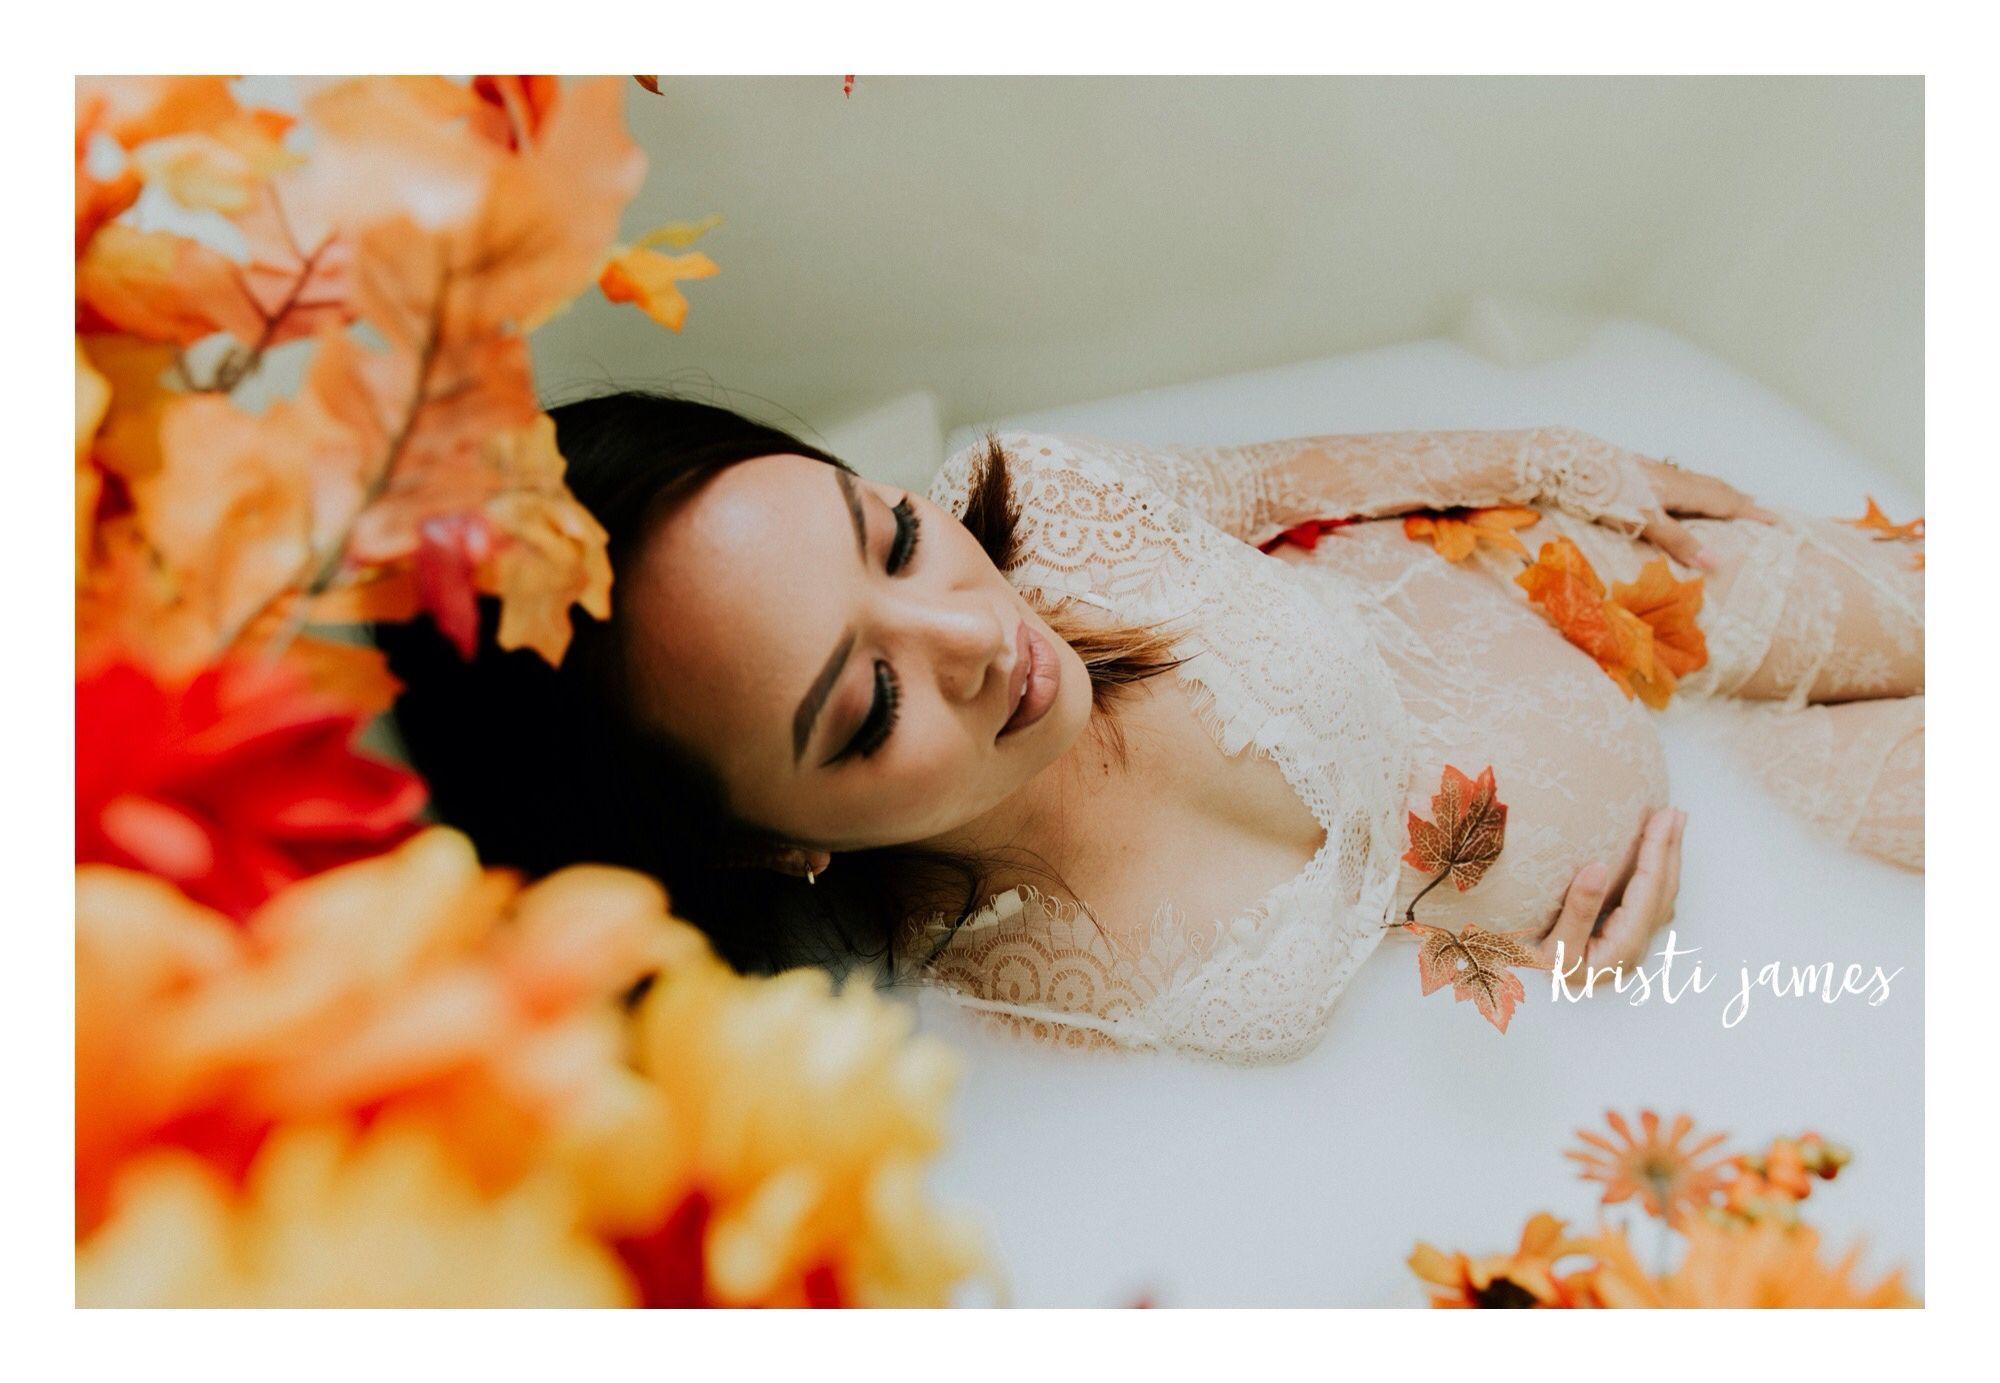 40 Milk Bath Photography Tips for Beginners